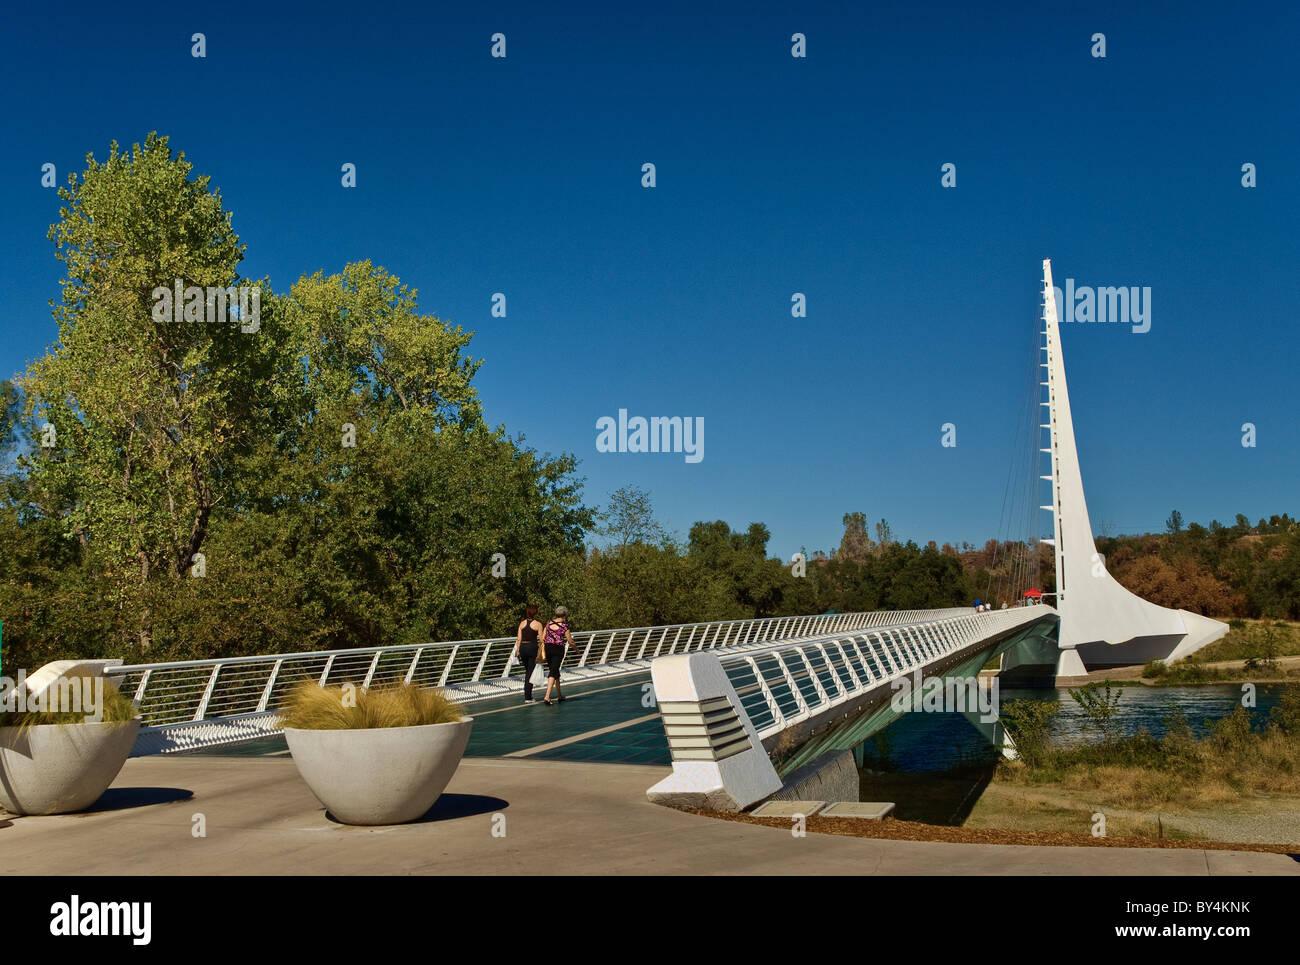 Pedestrian Sundial Bridge, designed by Santiago Calatrava, over Turtle Bay at Sacramento River in Redding, California, - Stock Image